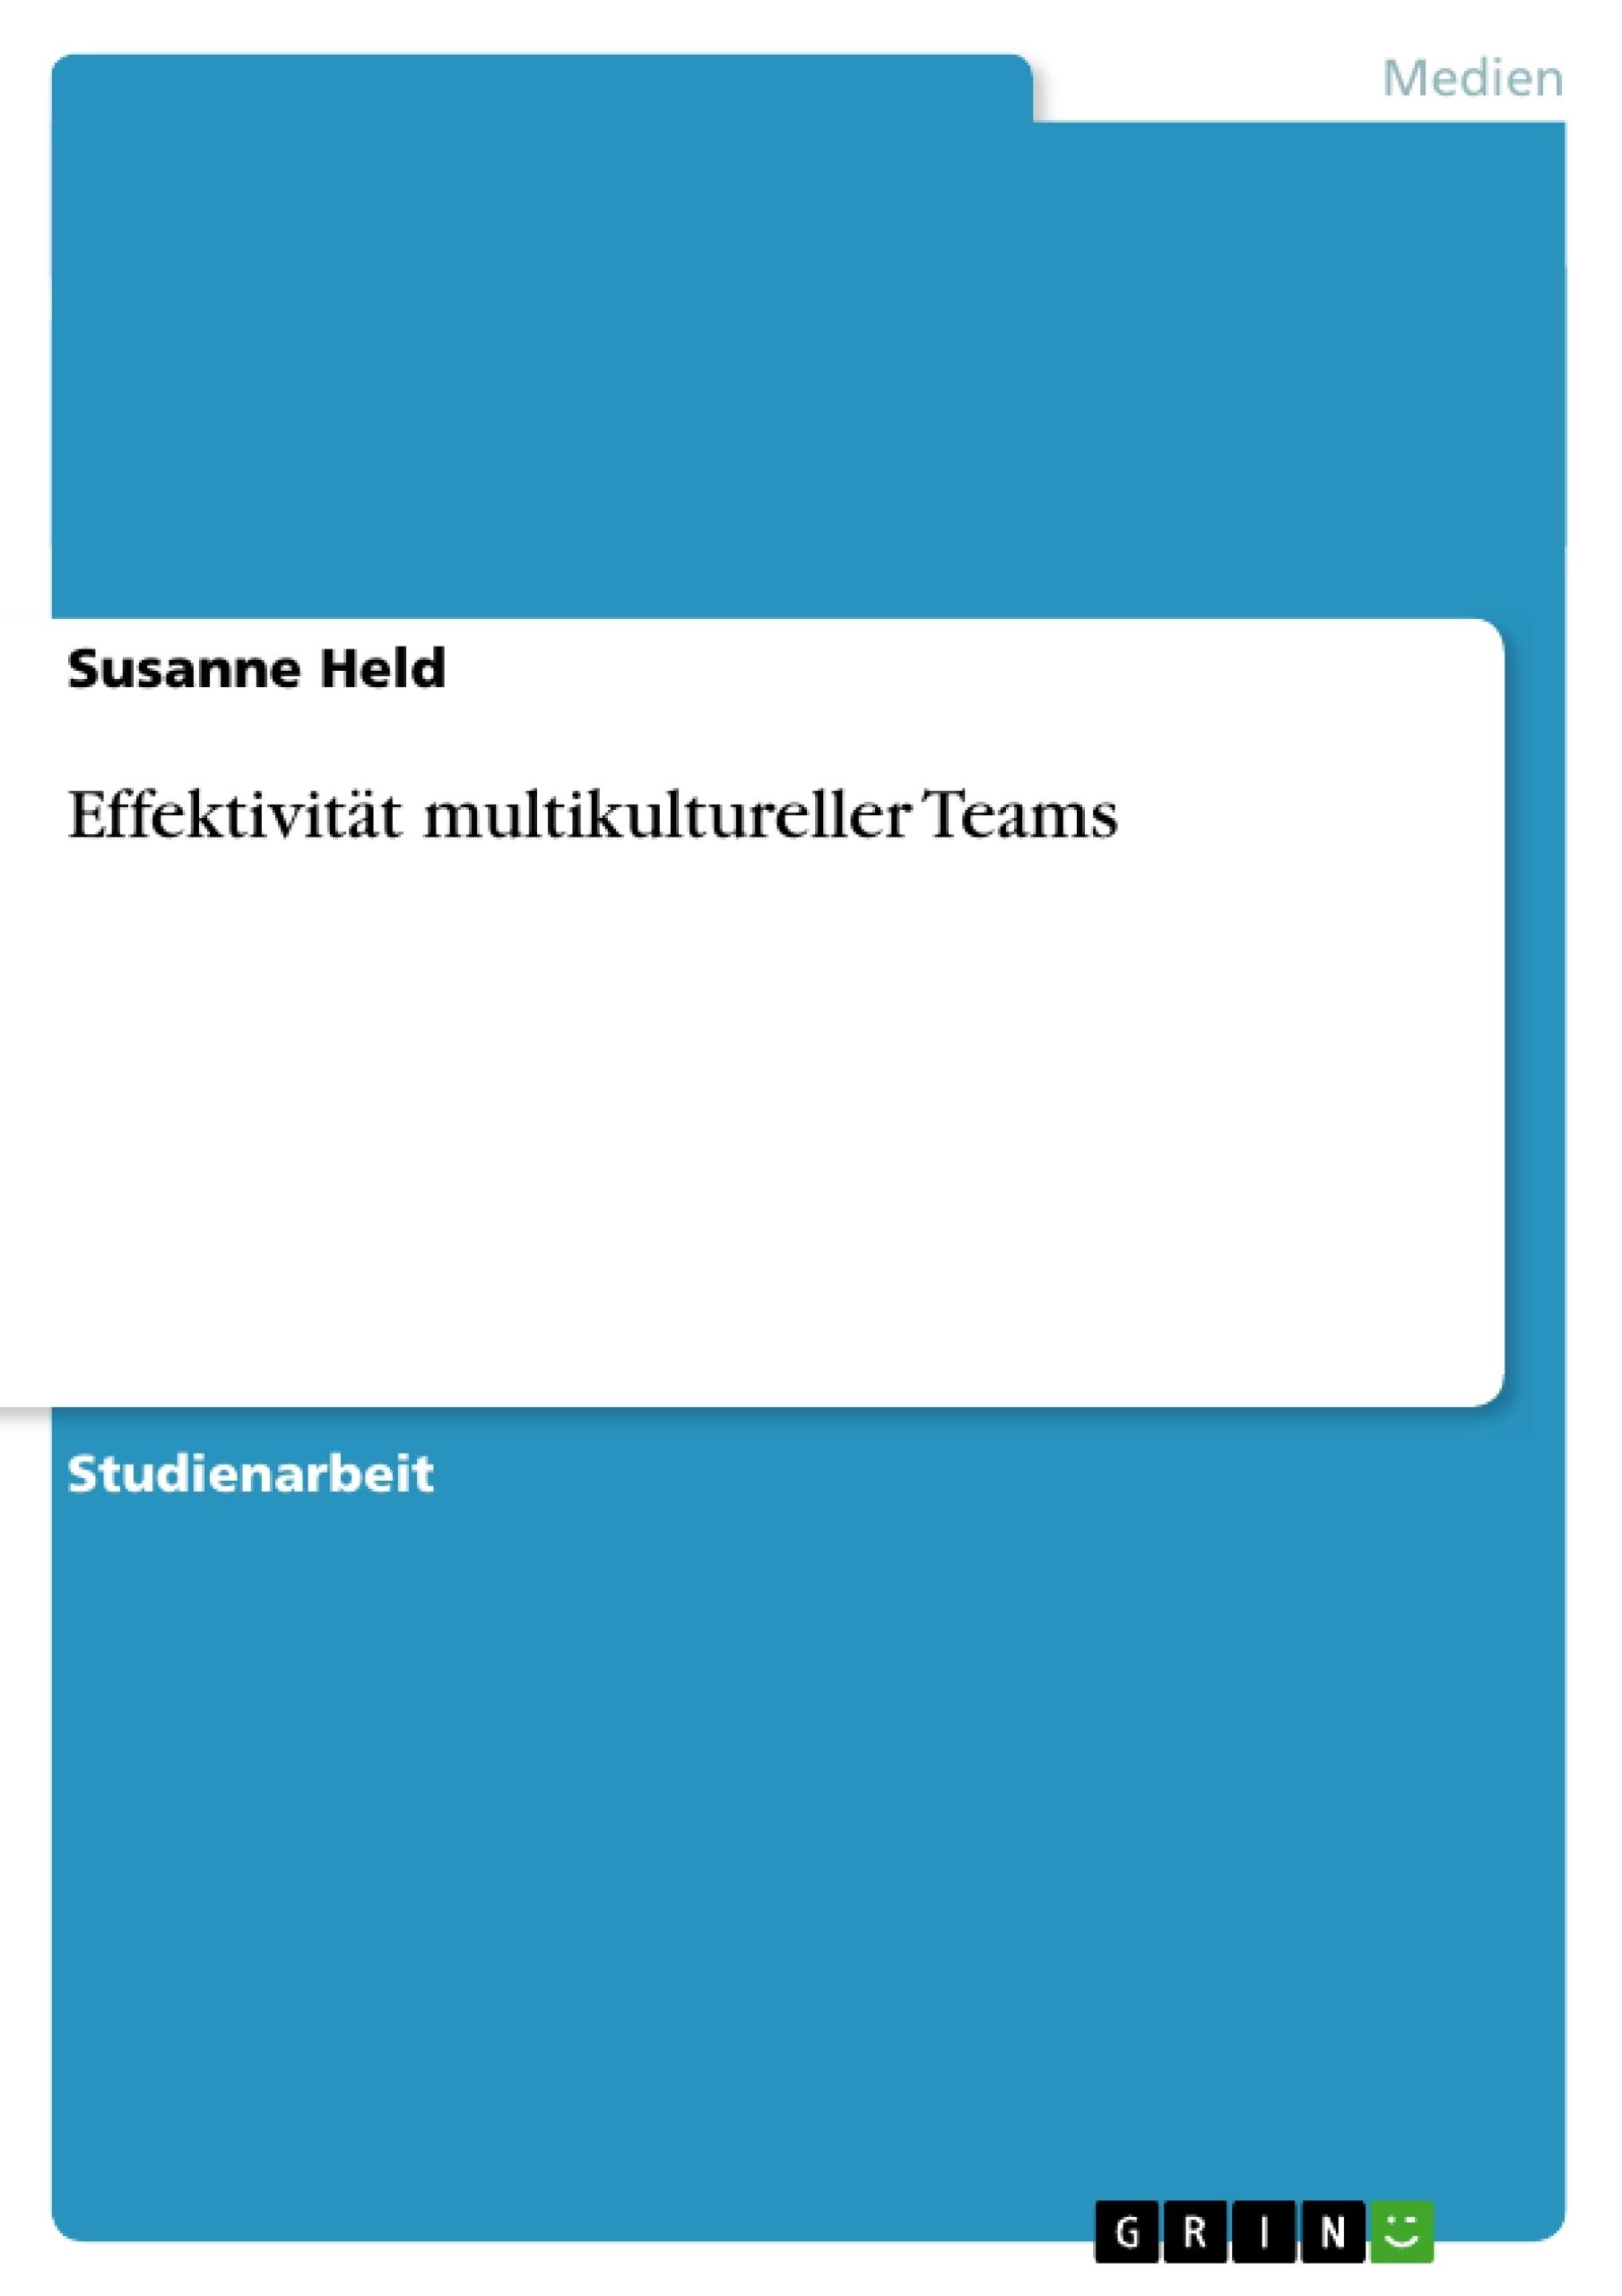 Titel: Effektivität multikultureller Teams